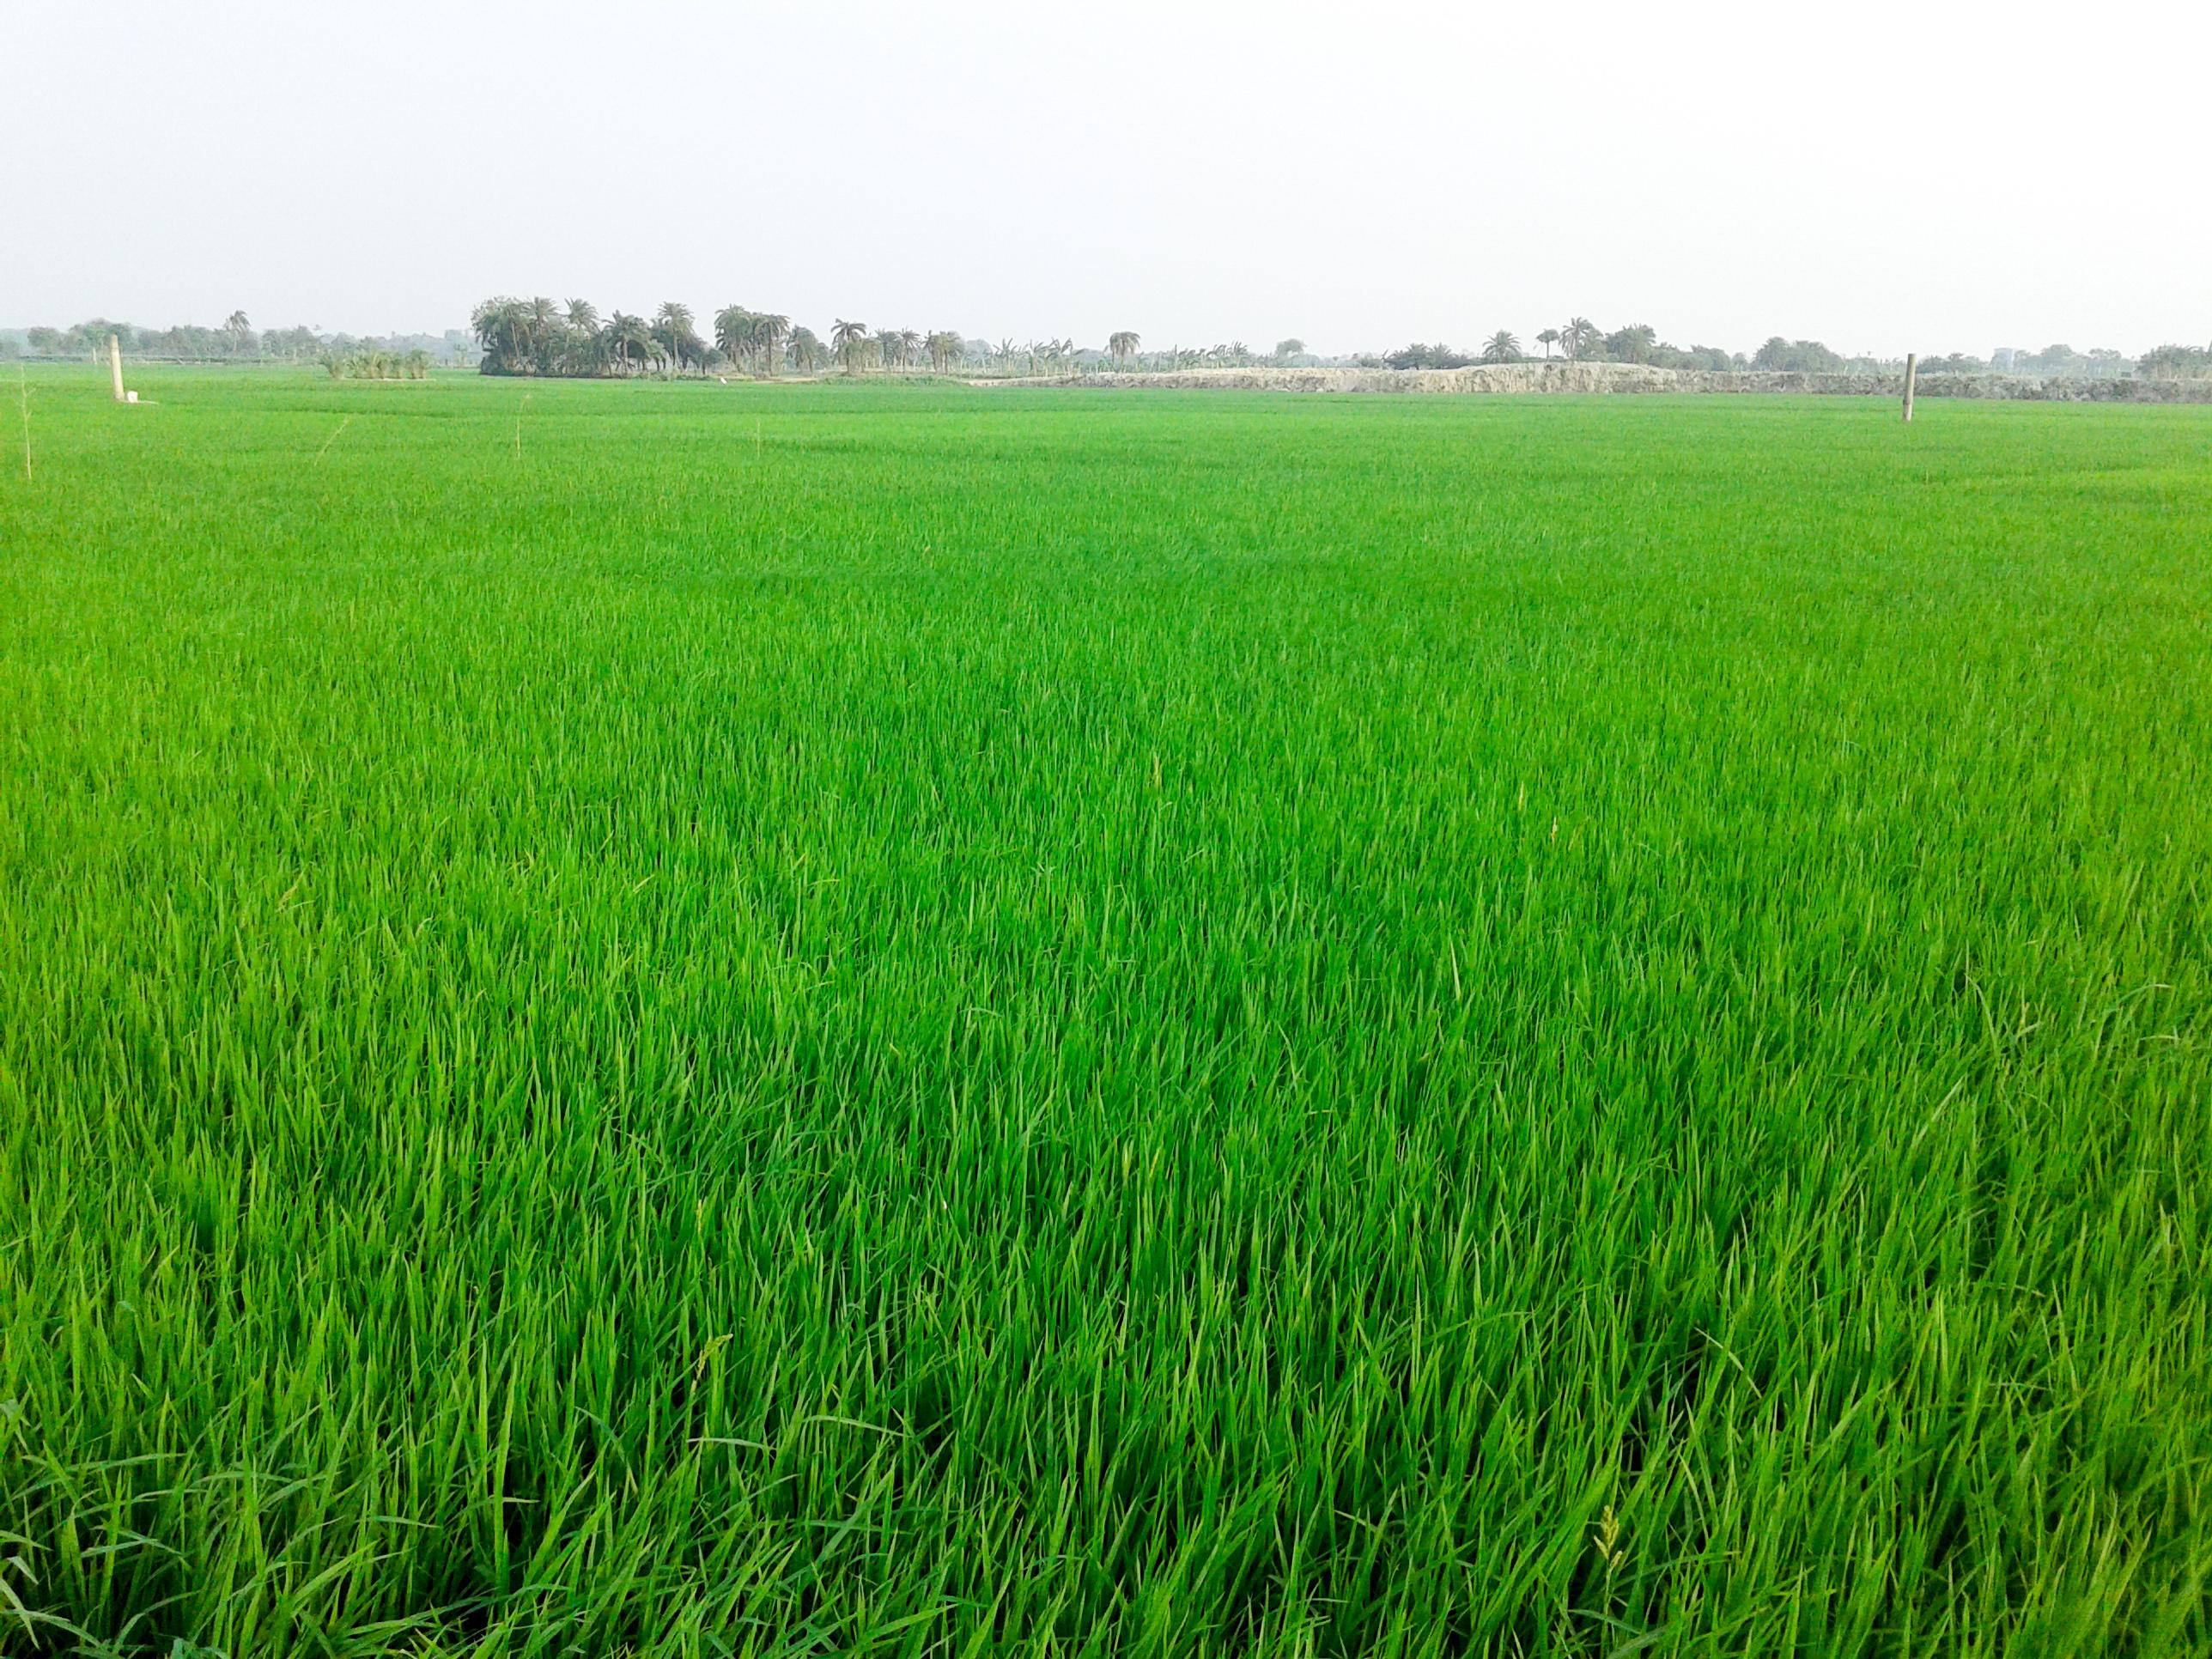 File:Green Crops.jpeg - Wikimedia Commons